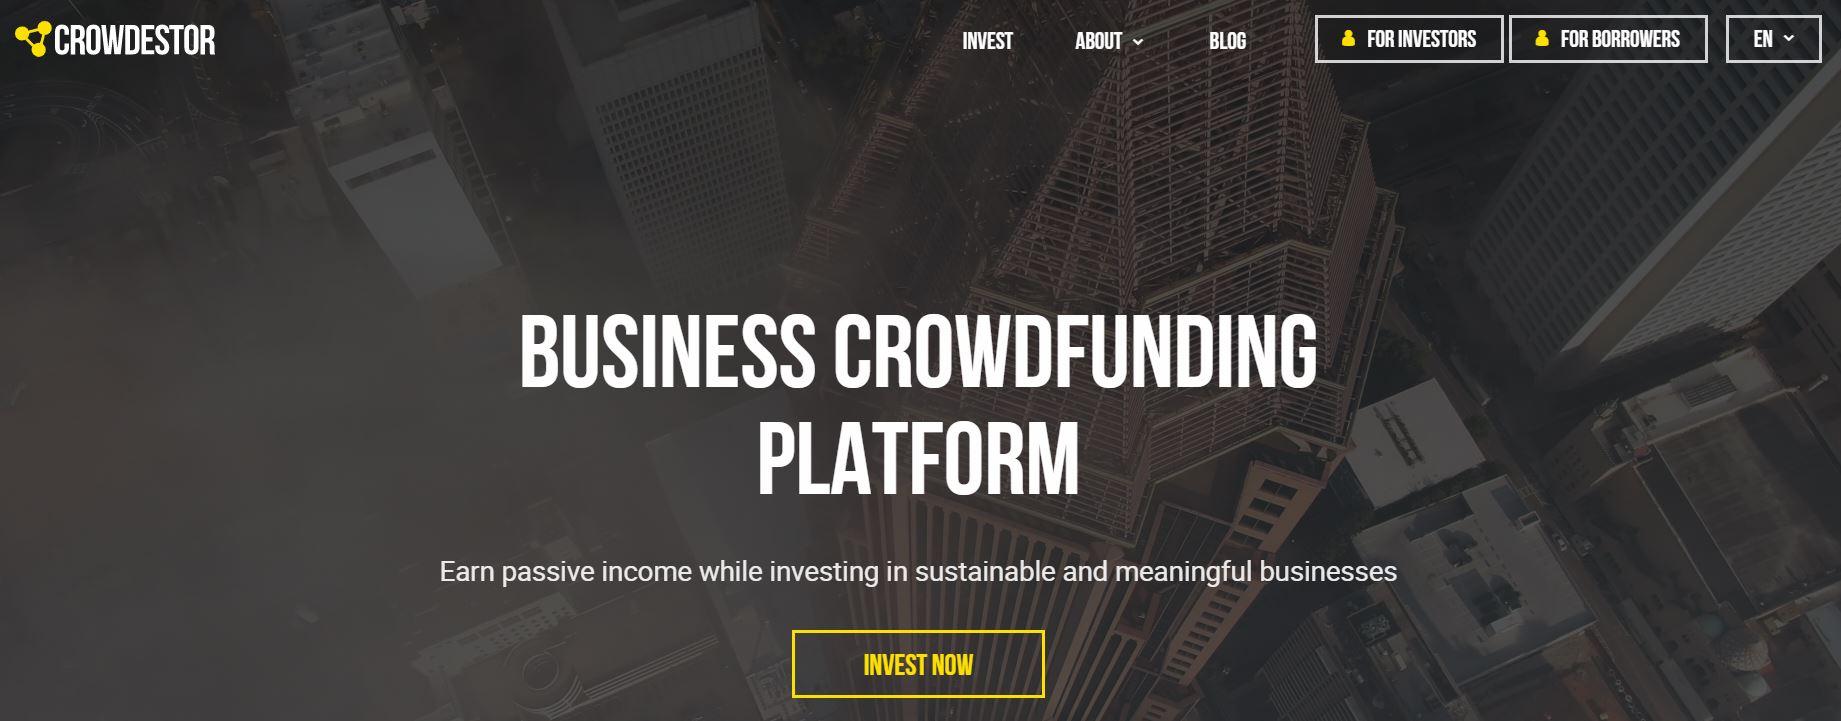 crowdestor crowdfunding immobiliare